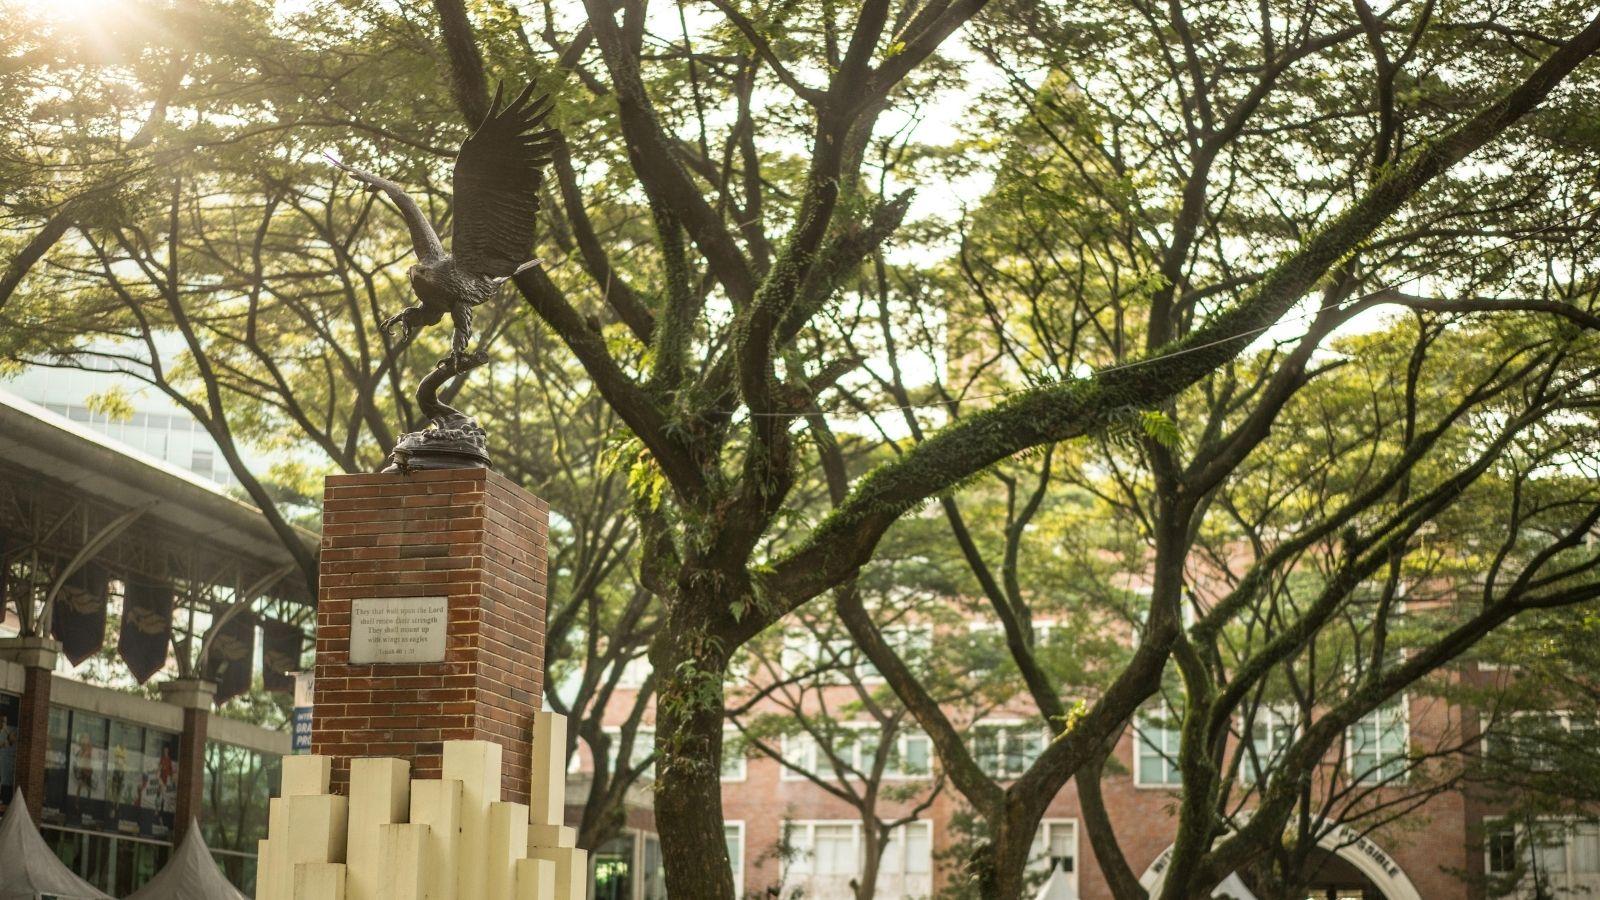 Universitas Pelita Harapan Accelerates Digital Transformation for Students and Teachers